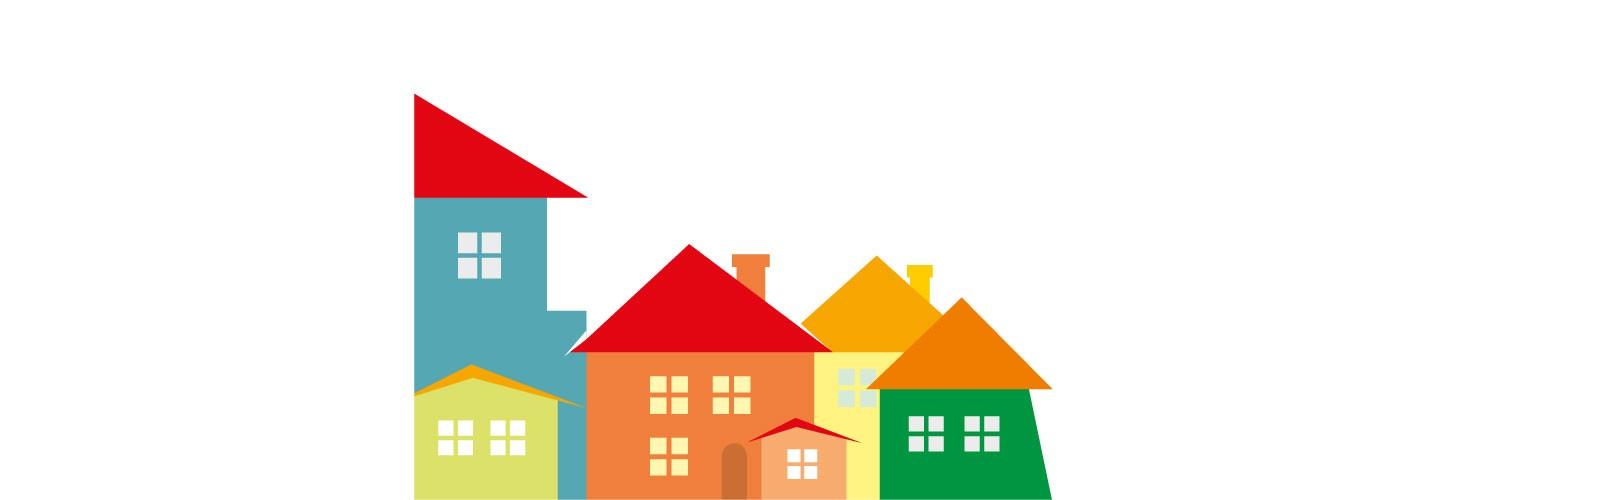 How Do I House Code?